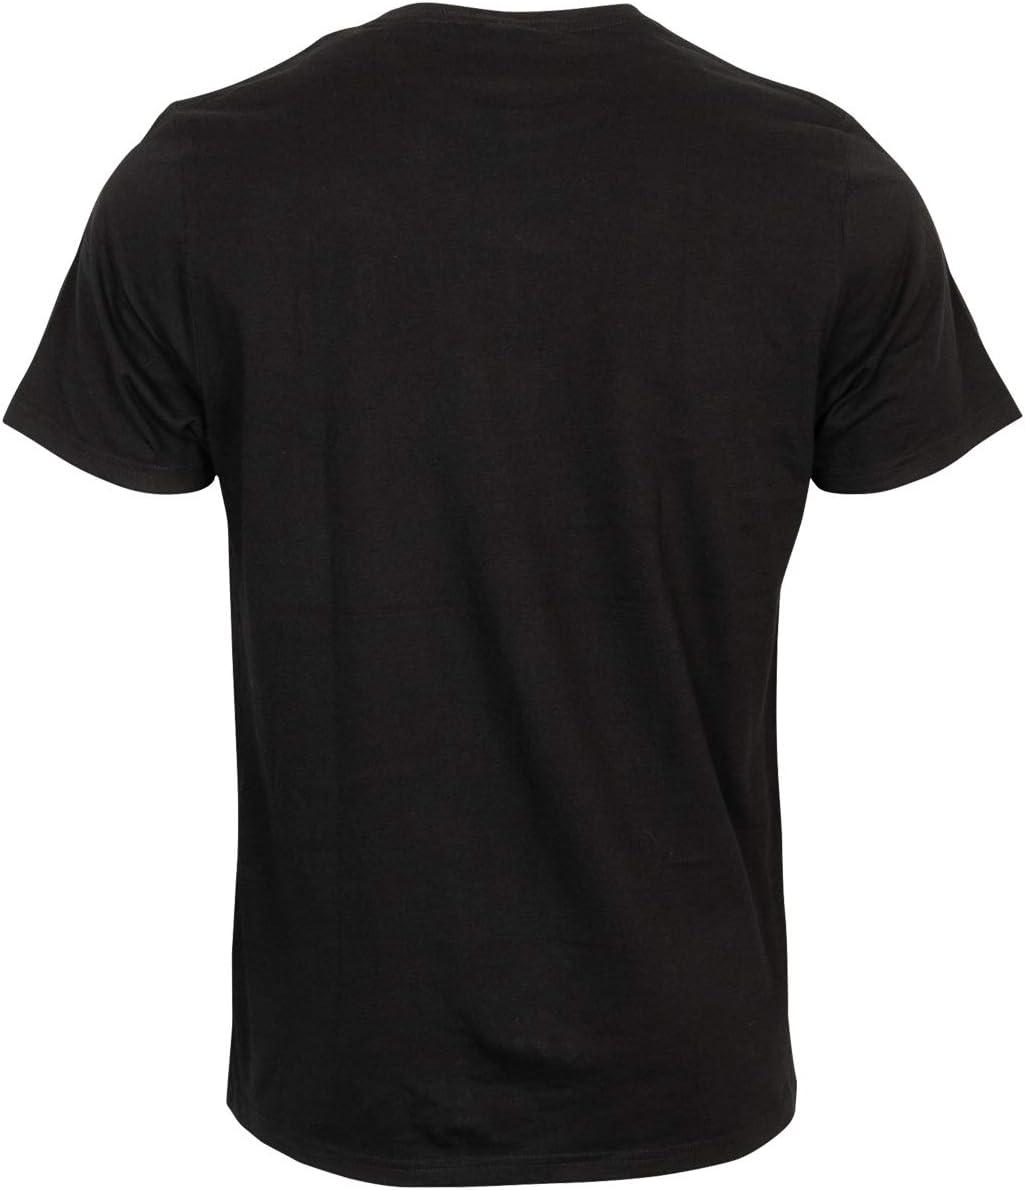 Pauli T-Shirt Shirt Oberteil Totenkopf Aufdruck Coppergold Kollektion 2020 Herren M/änner schwarz FC St